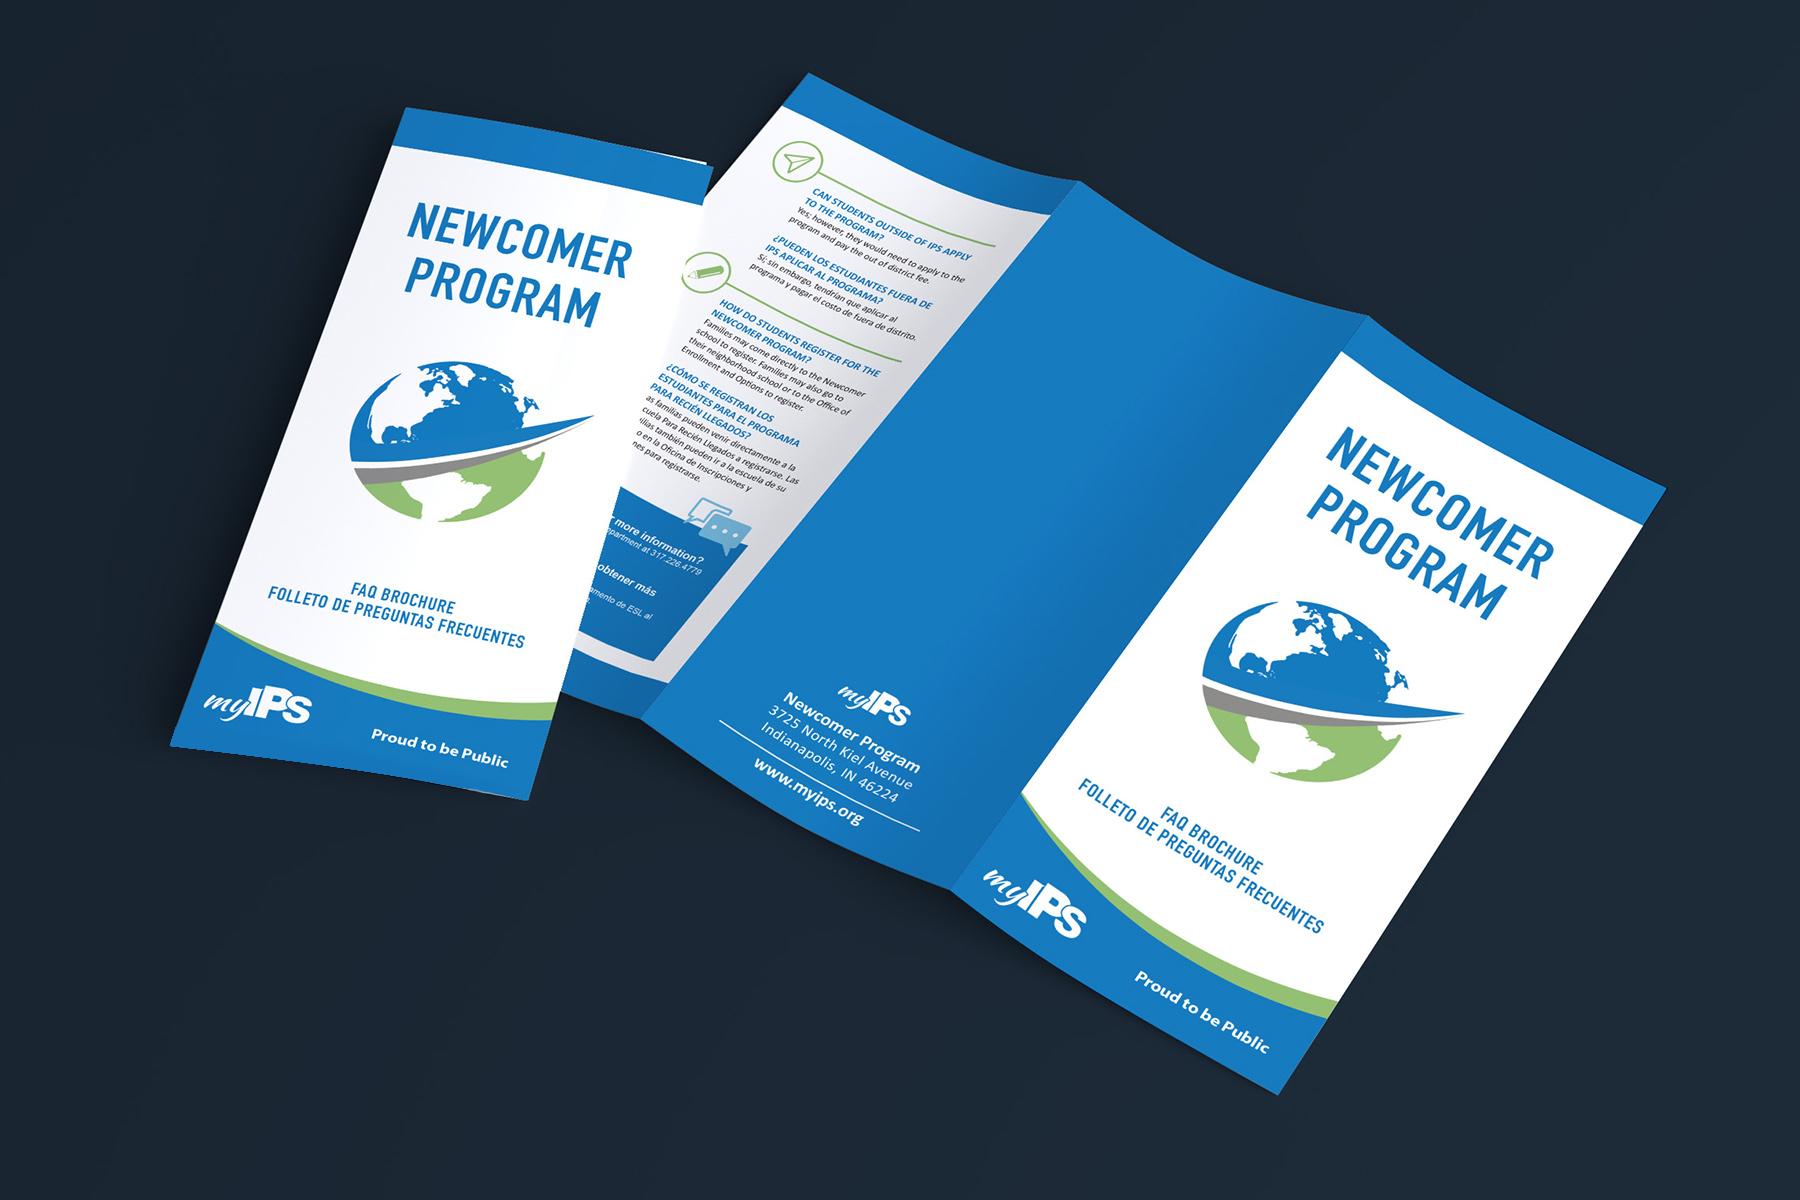 Indianapolis Public Schools - Newcomer Program Brochure Design